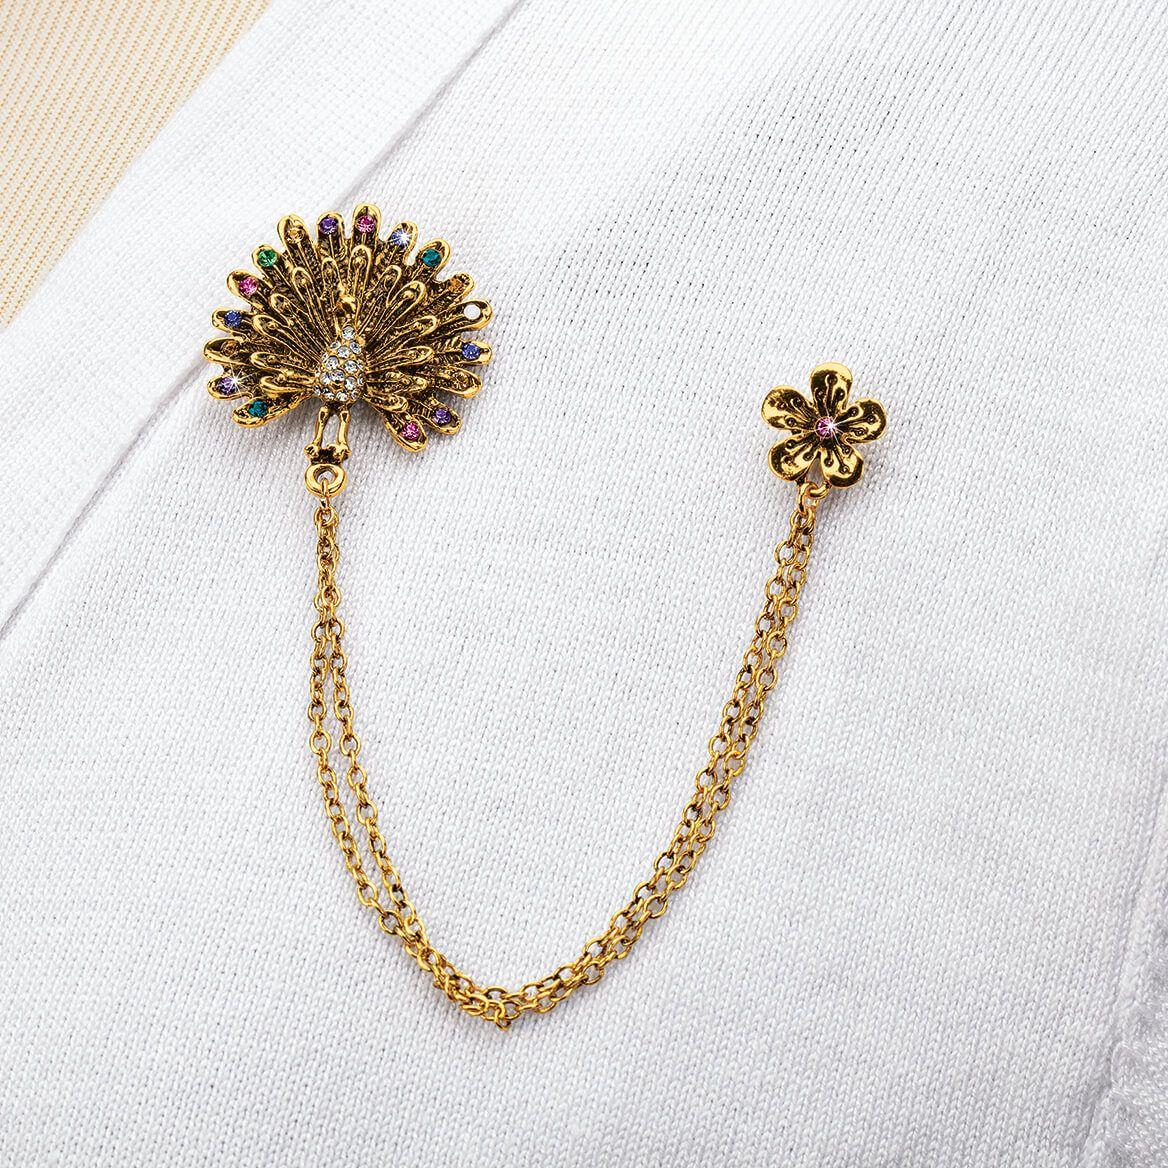 Peacock Dual Chain Brooch-371348